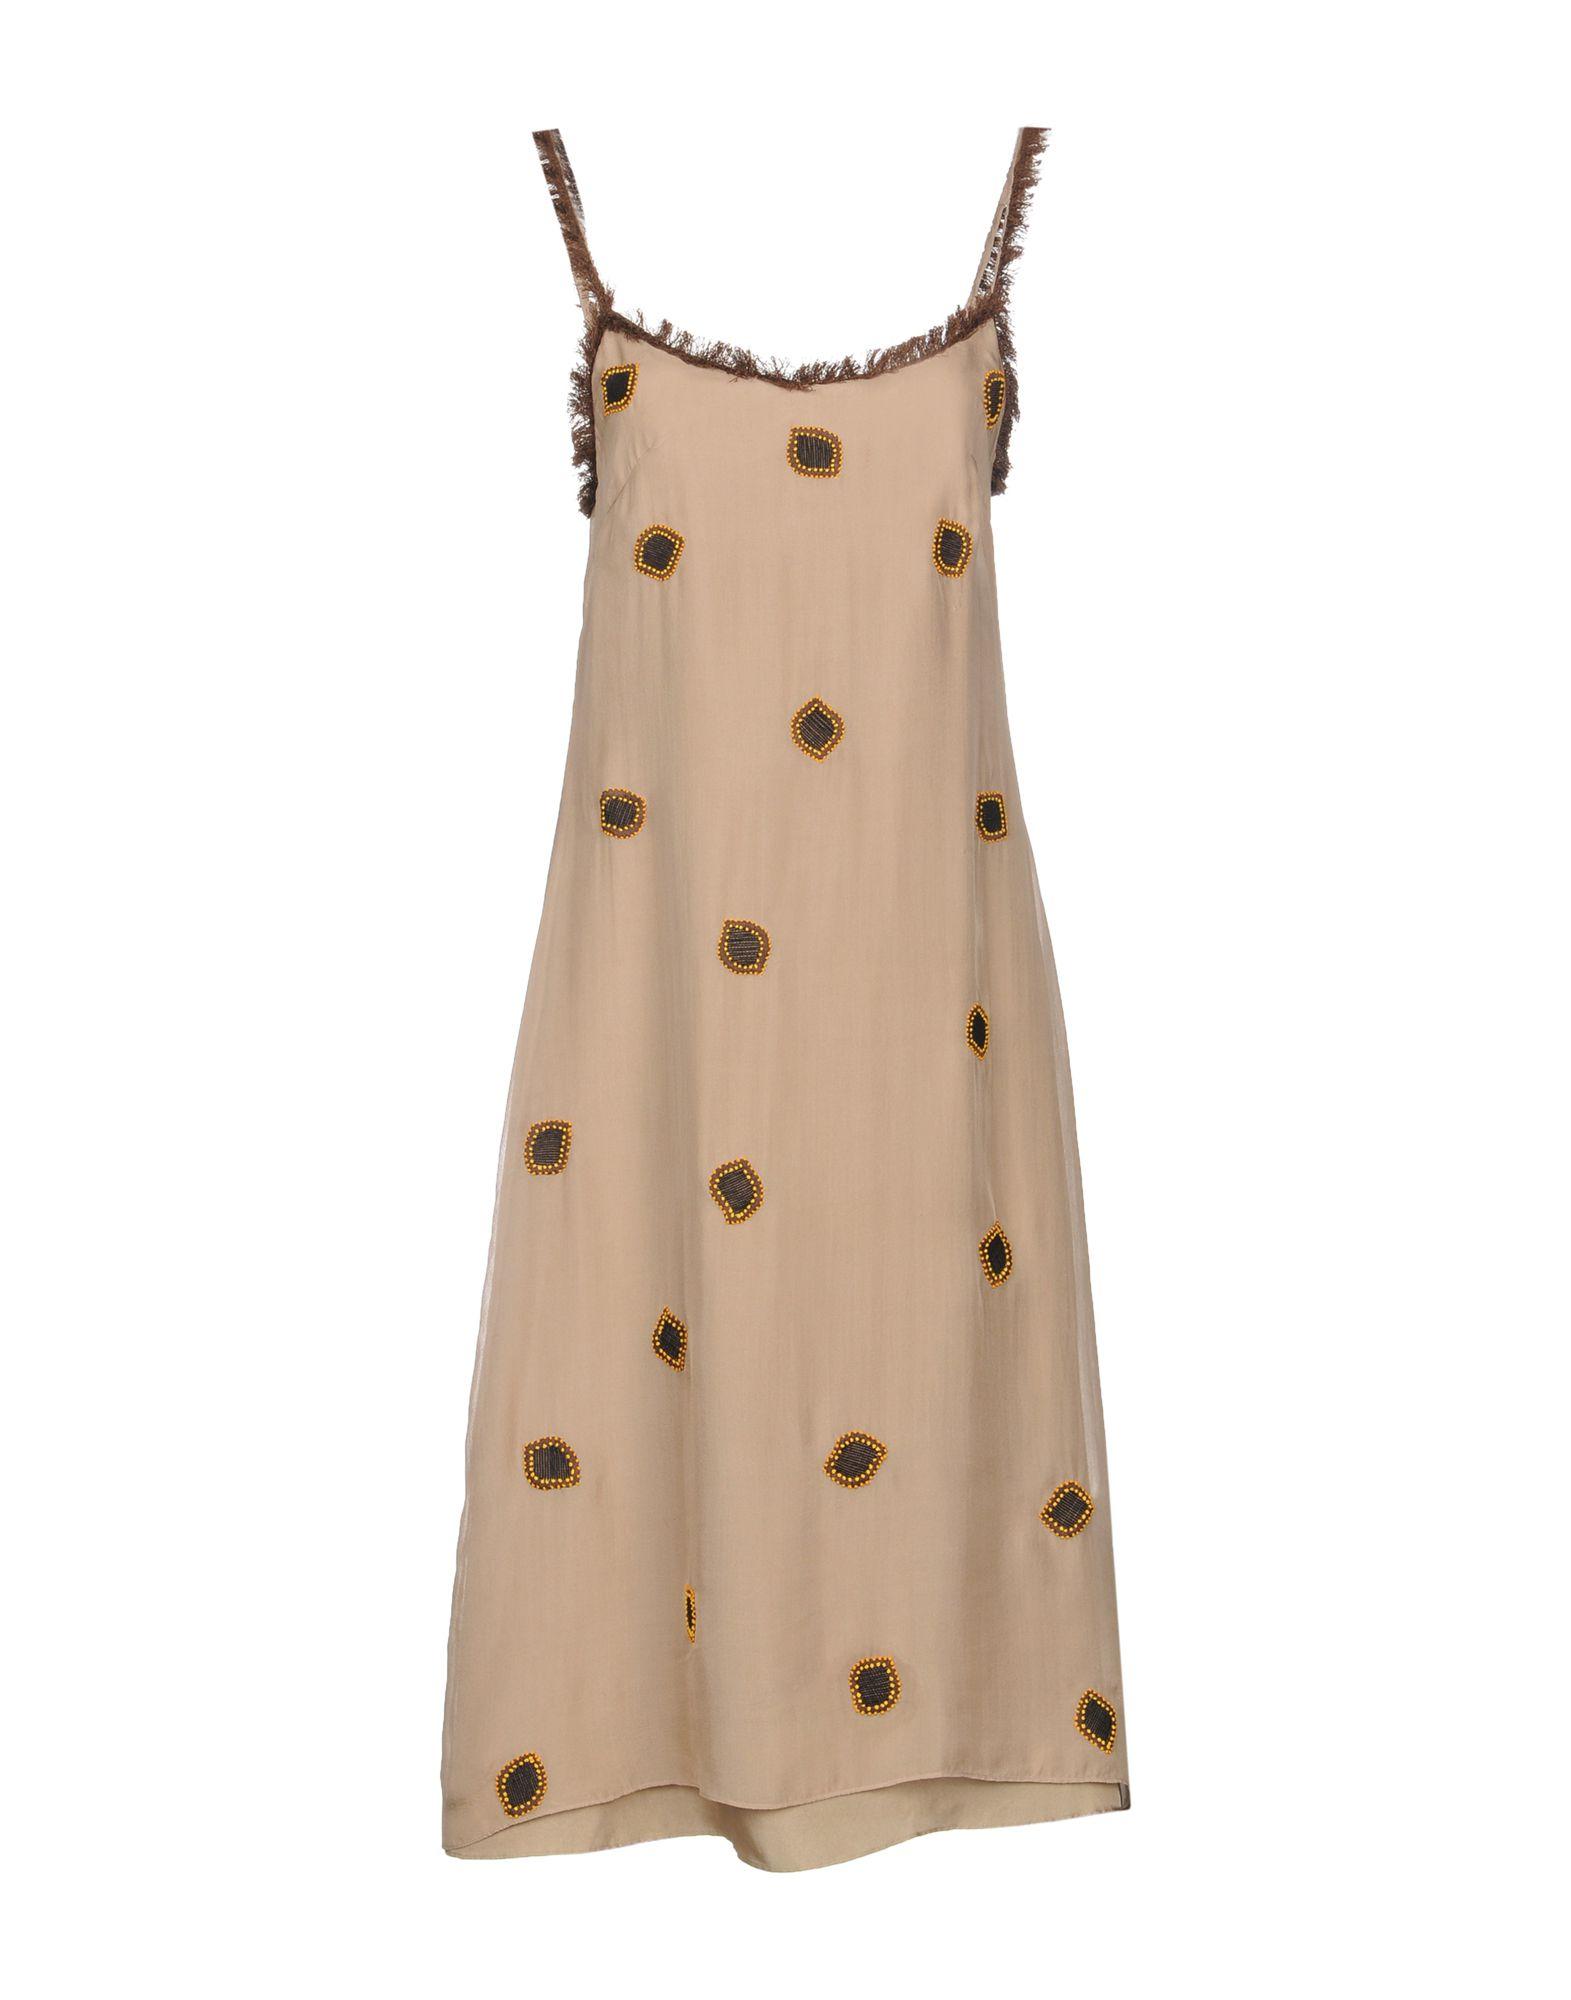 JUPE BY JACKIE Midi Dress in Beige